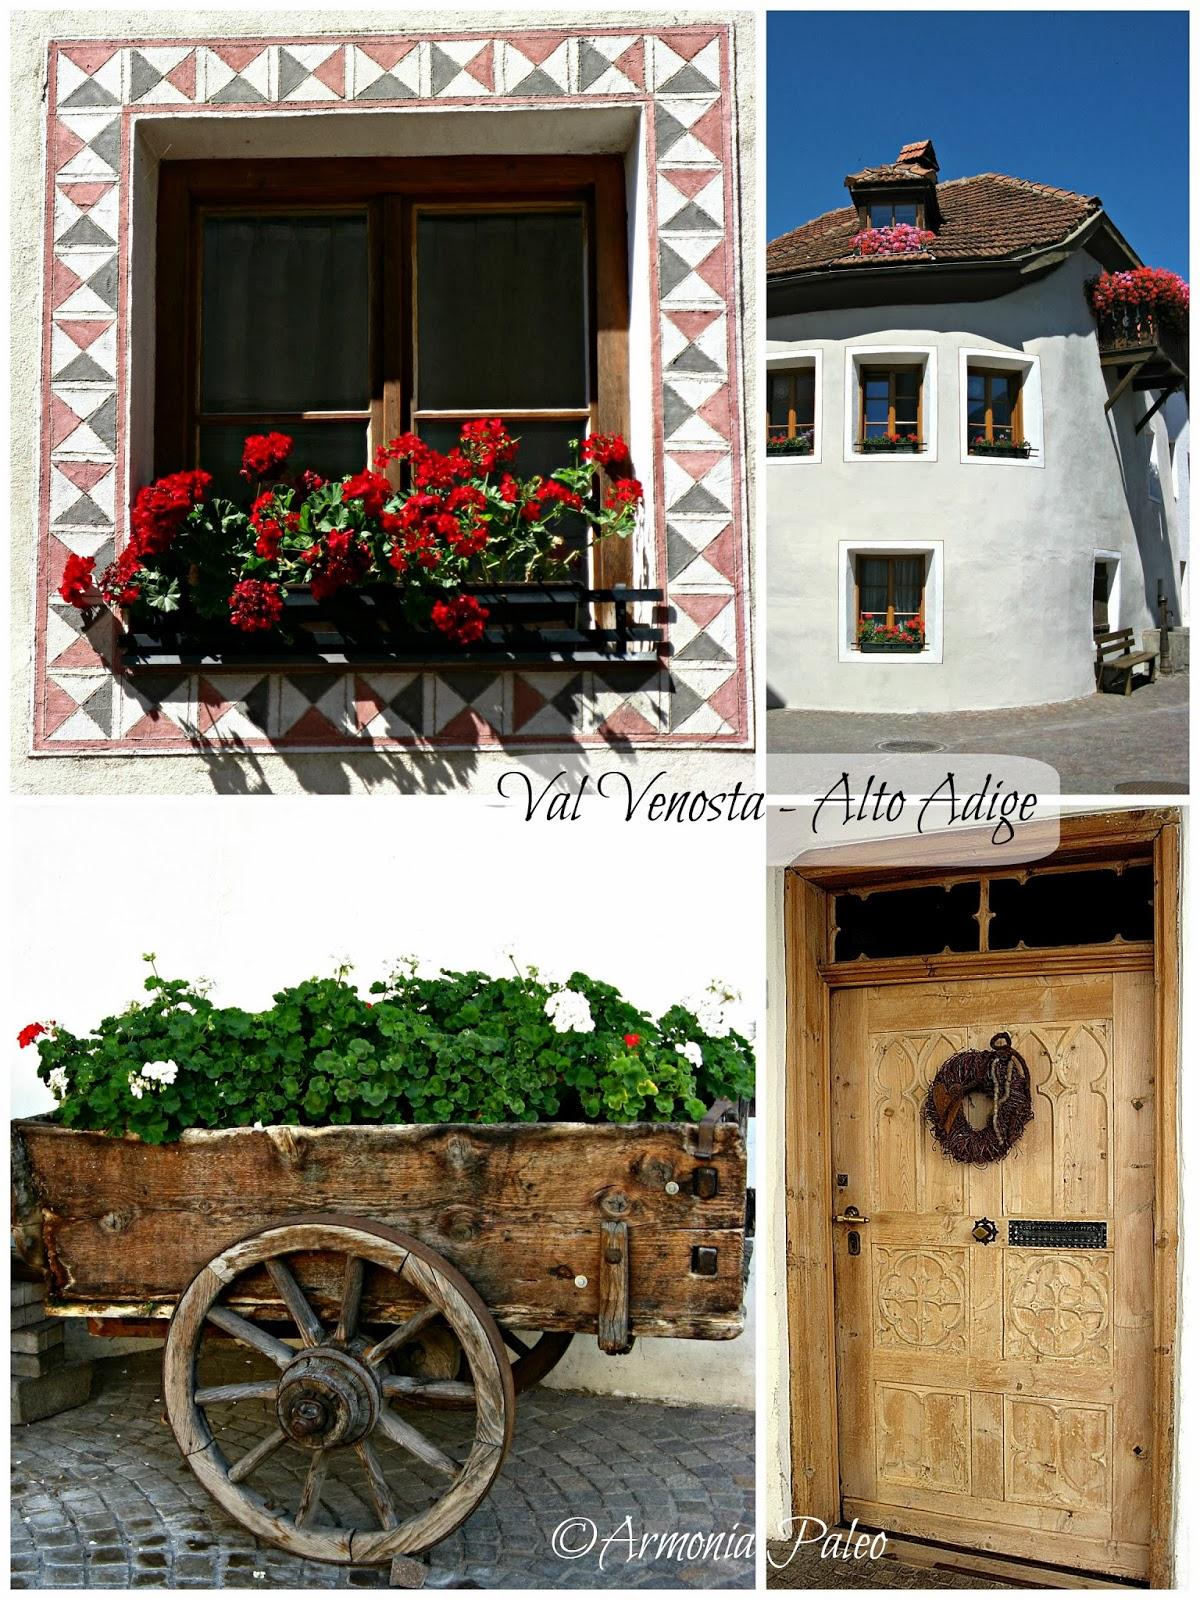 Val Venosta, Alto Adige - Foto di Armonia Paleo